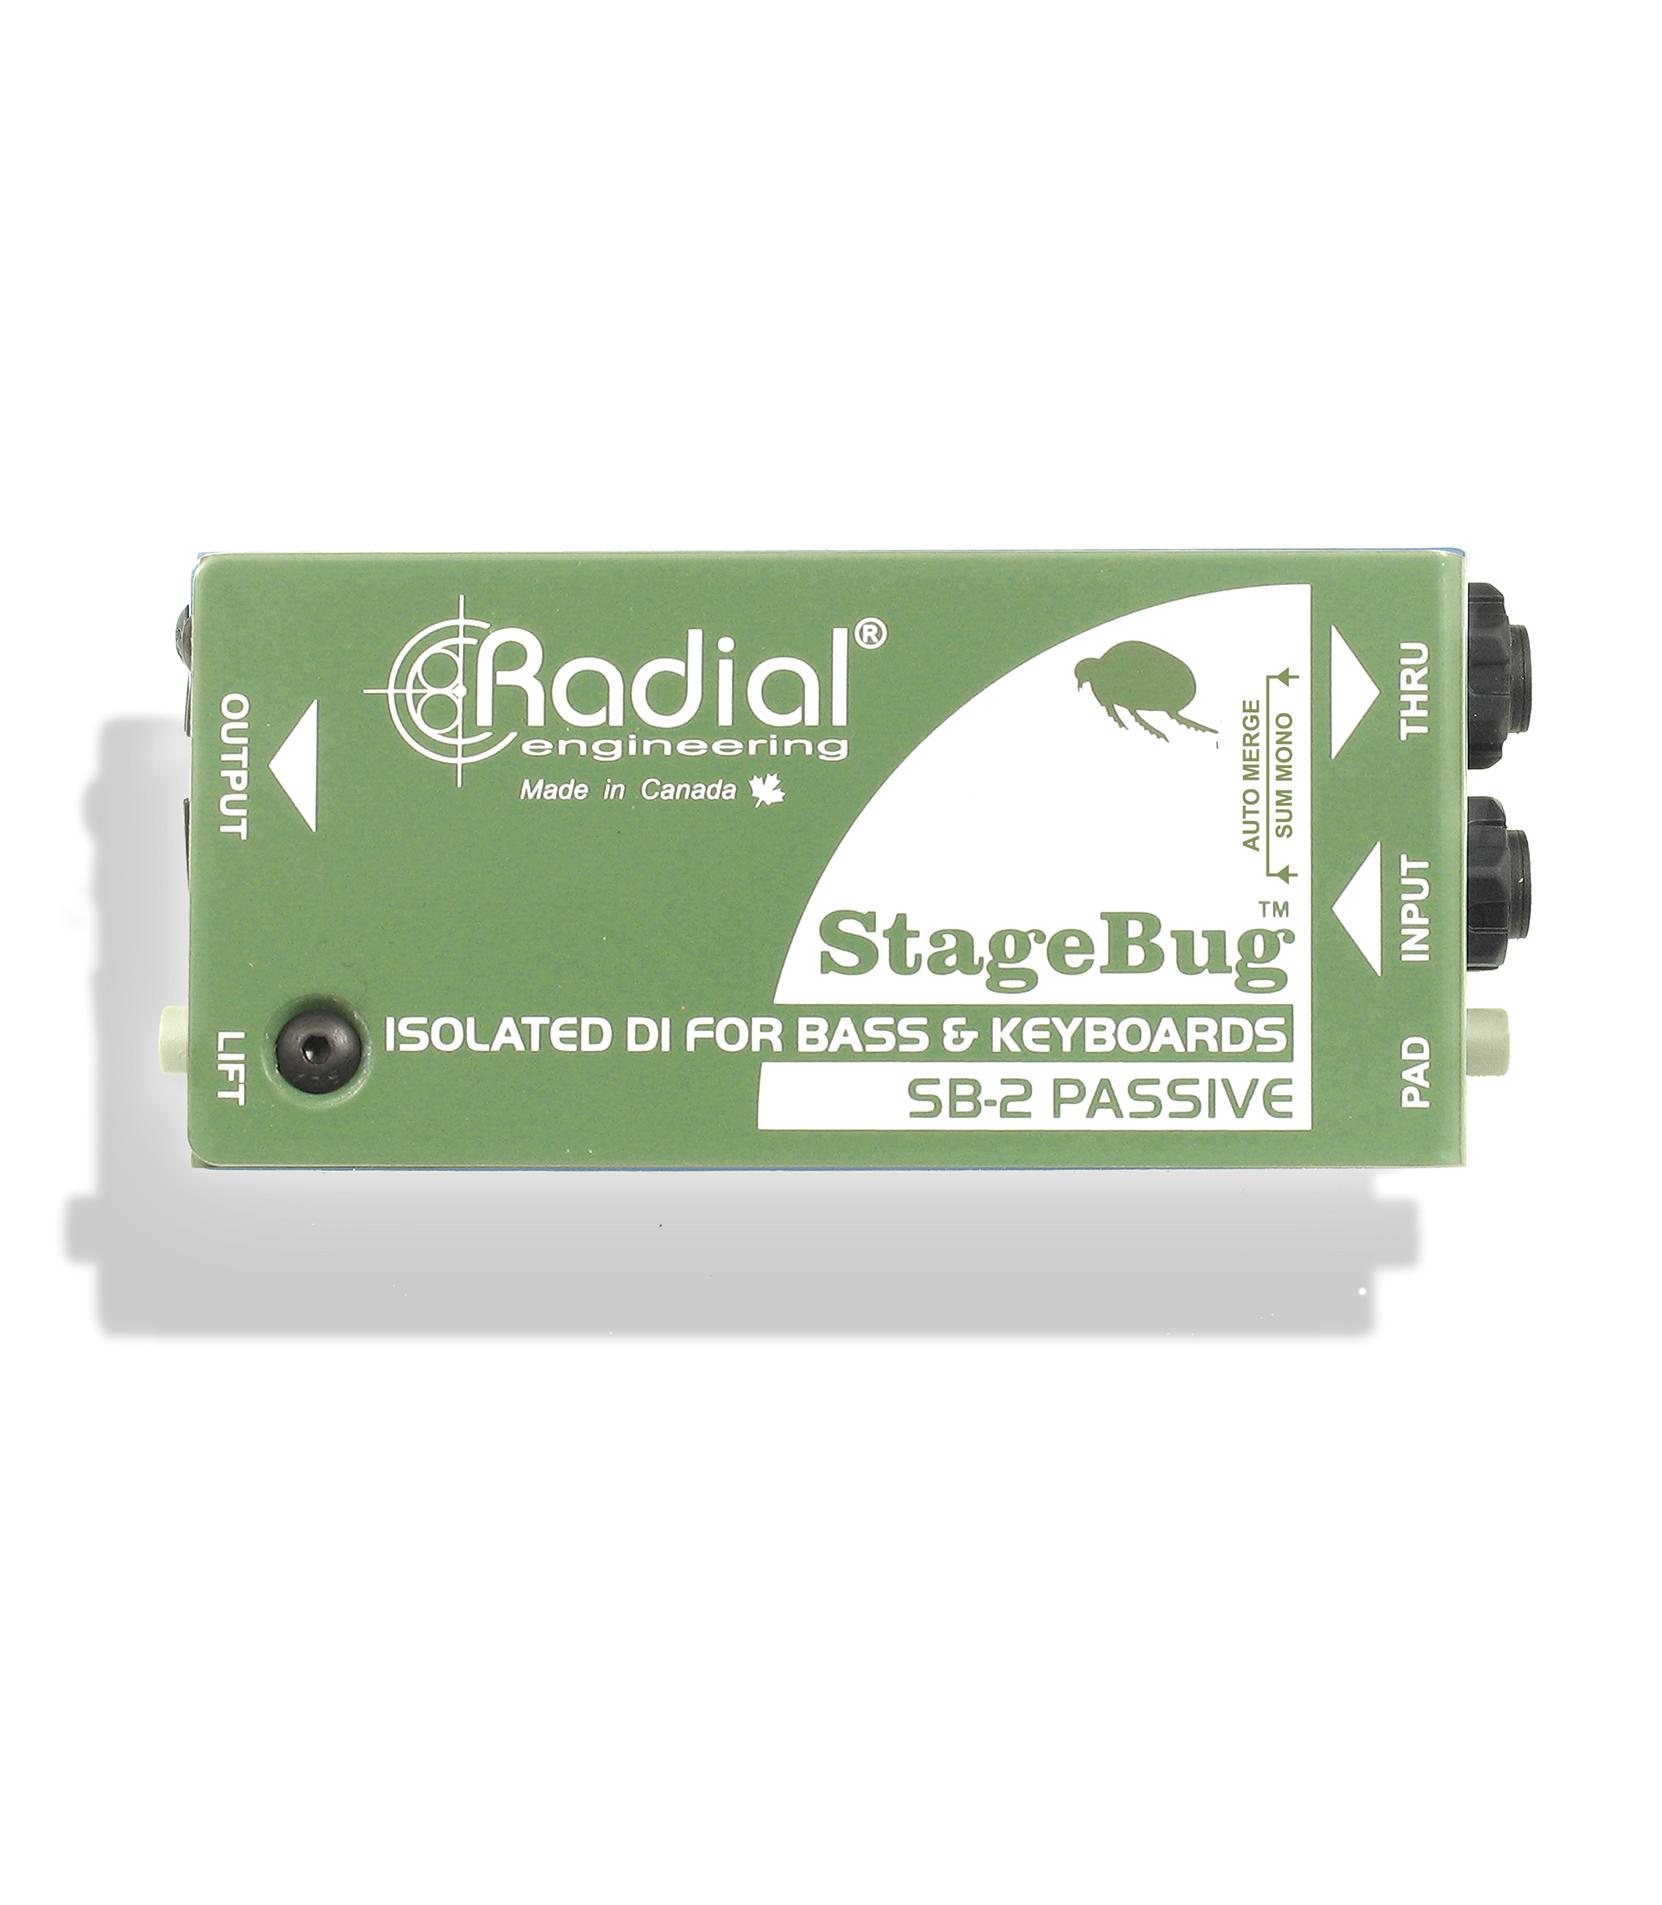 StageBug SB-2